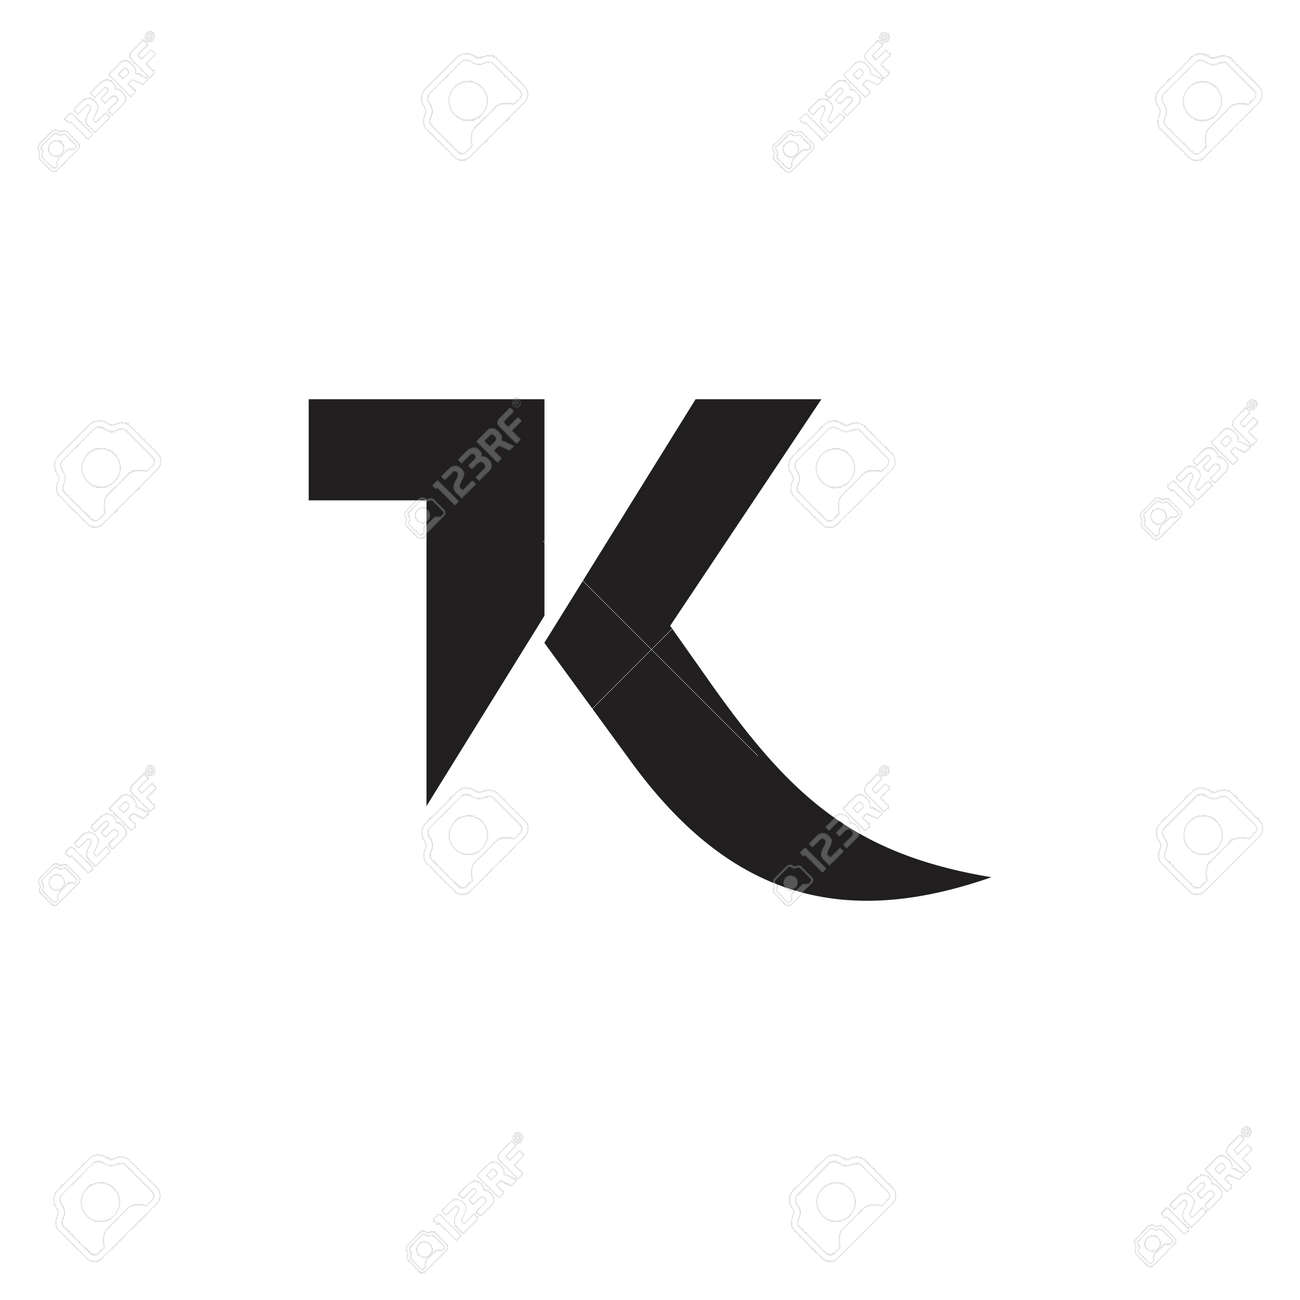 letters 1k simple geometric vector - 119517370